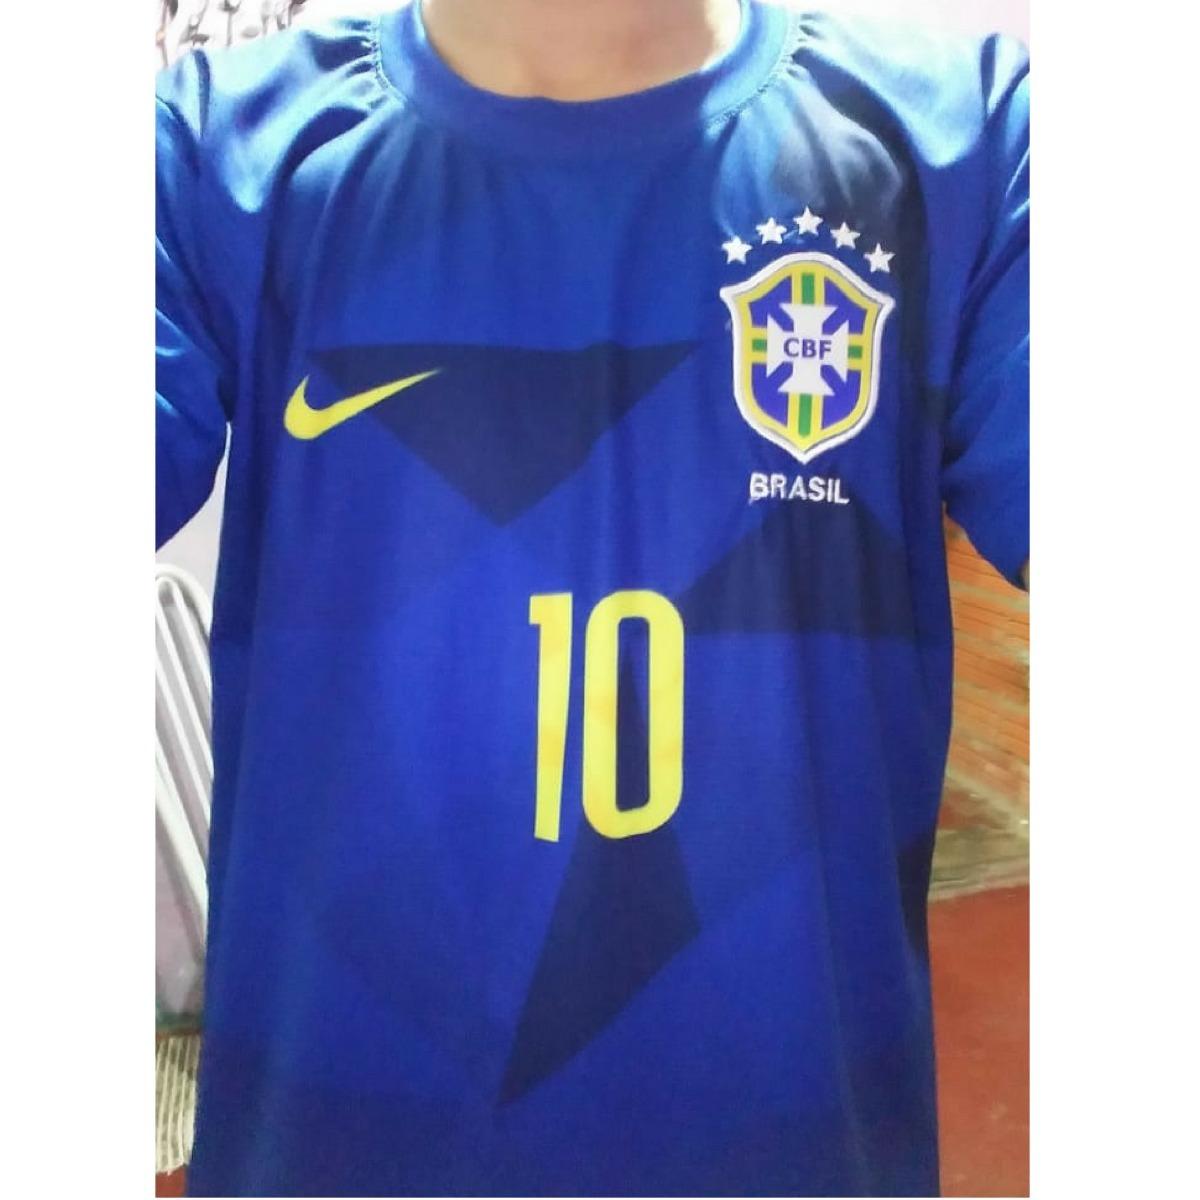 camisa brasil azul neymar copa 2018 nike seleção brasilei. Carregando zoom. 52d5c2817b6fb